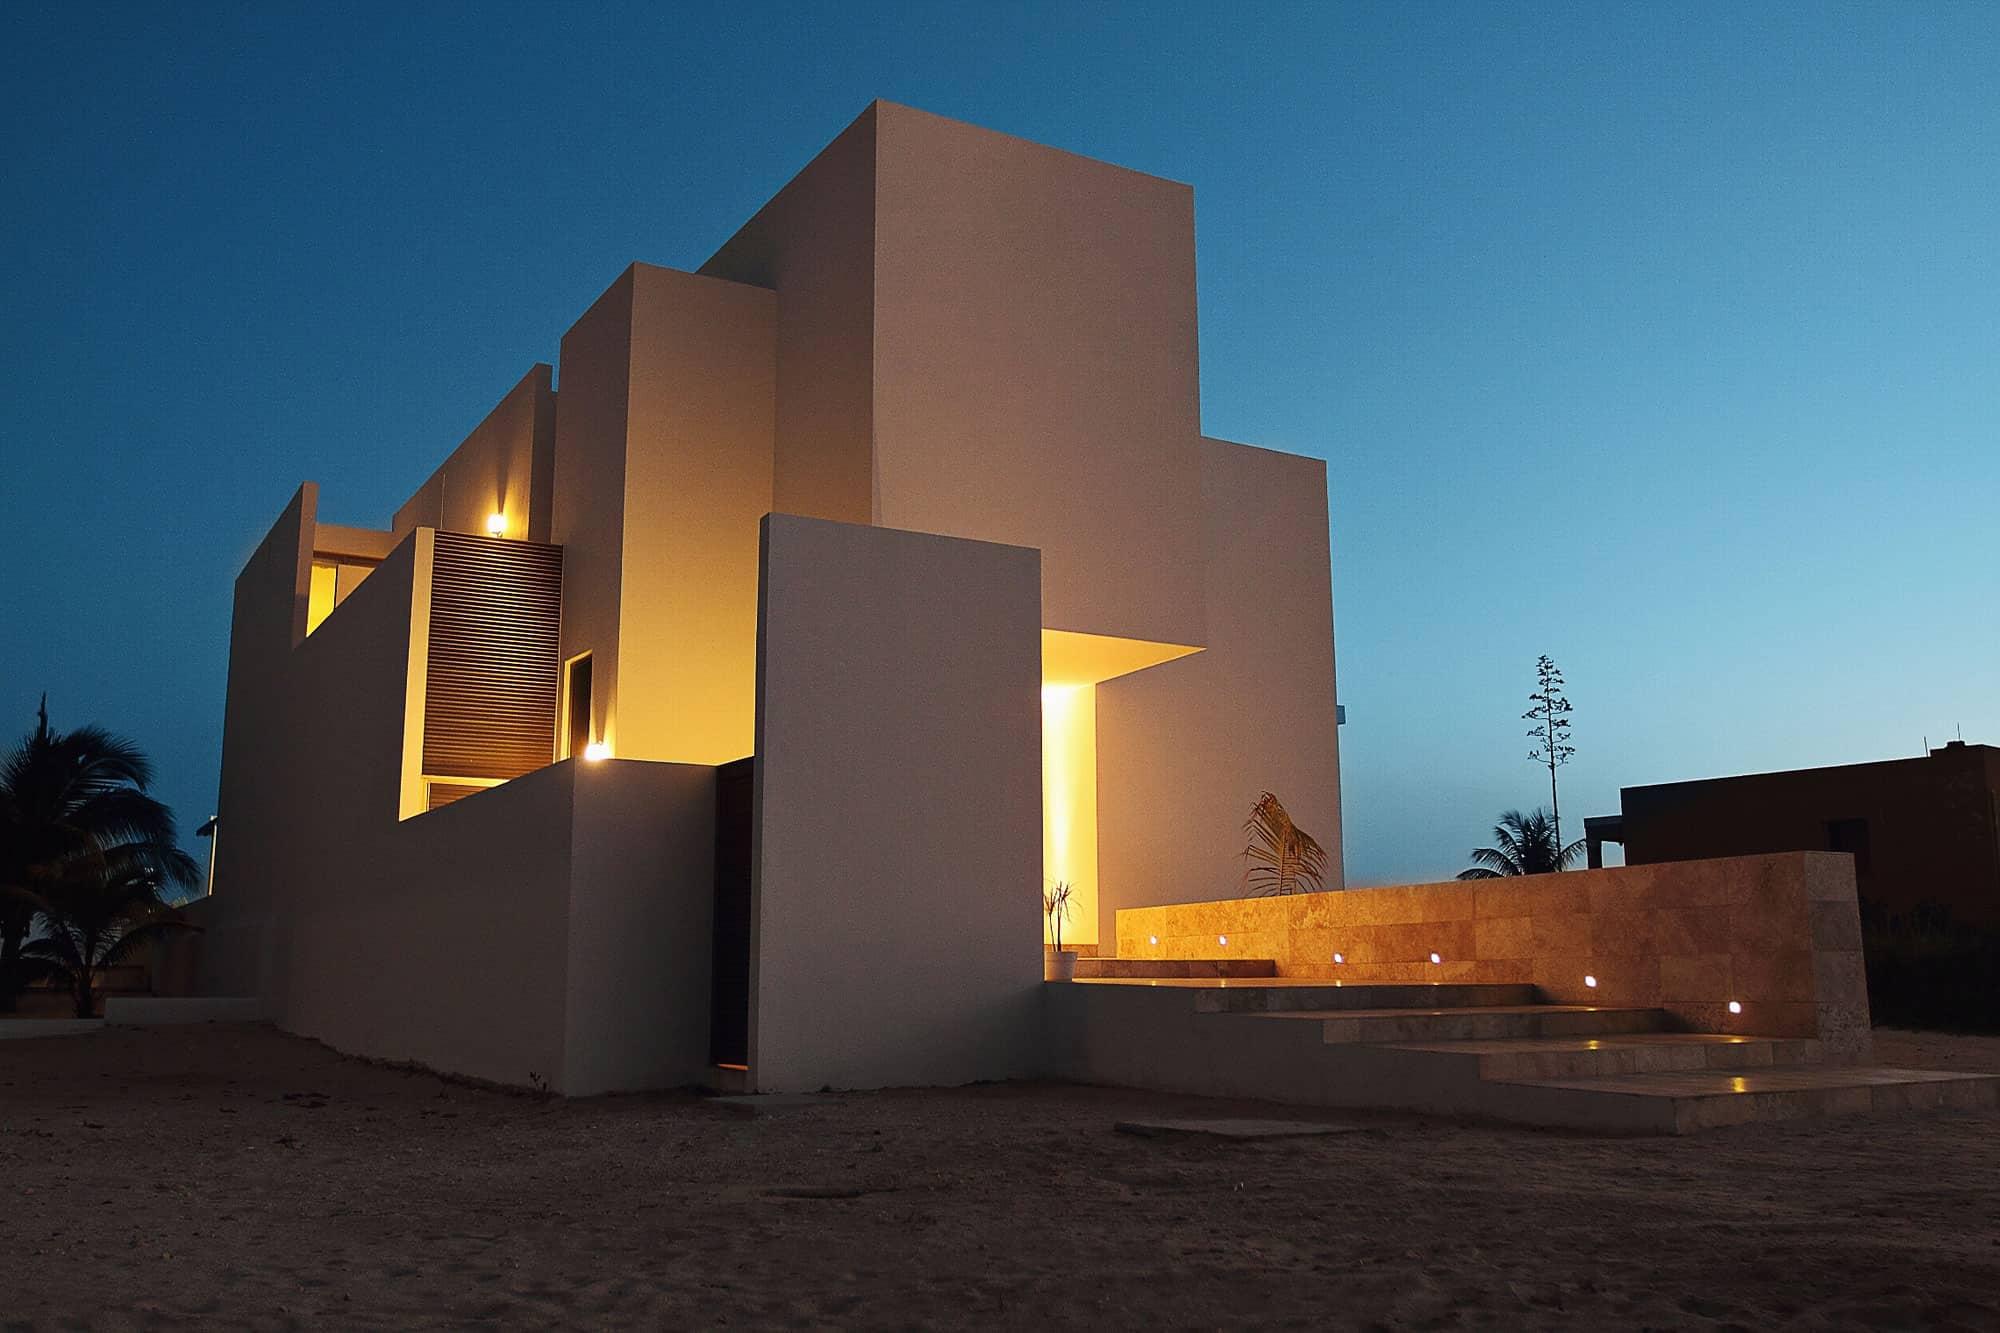 Tuunich Kanab by Seijo Peon Arquitectos (11)